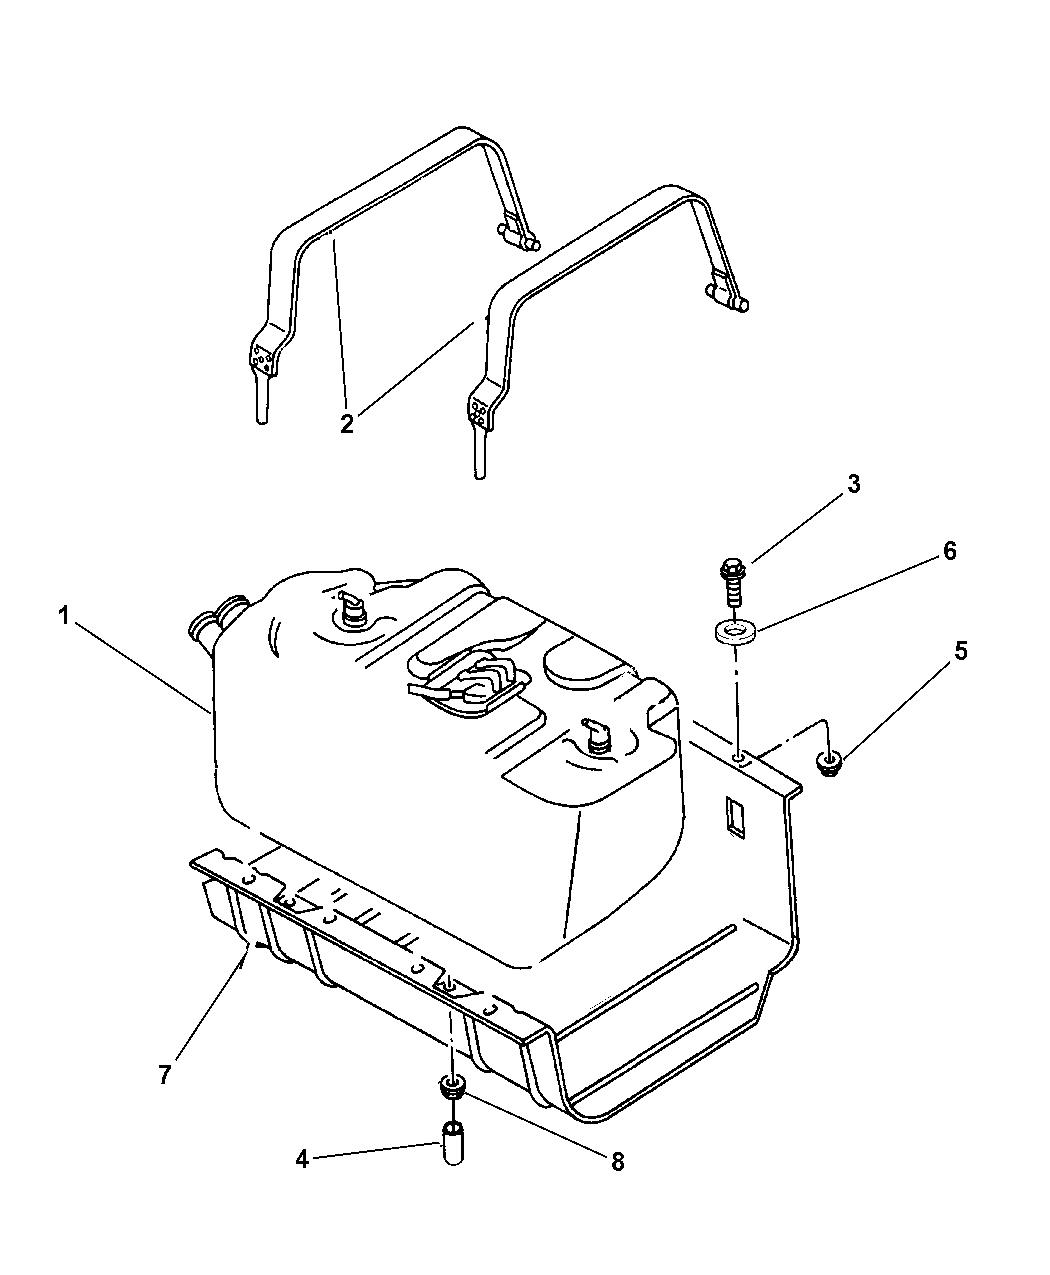 1997 jeep wrangler fuel tank